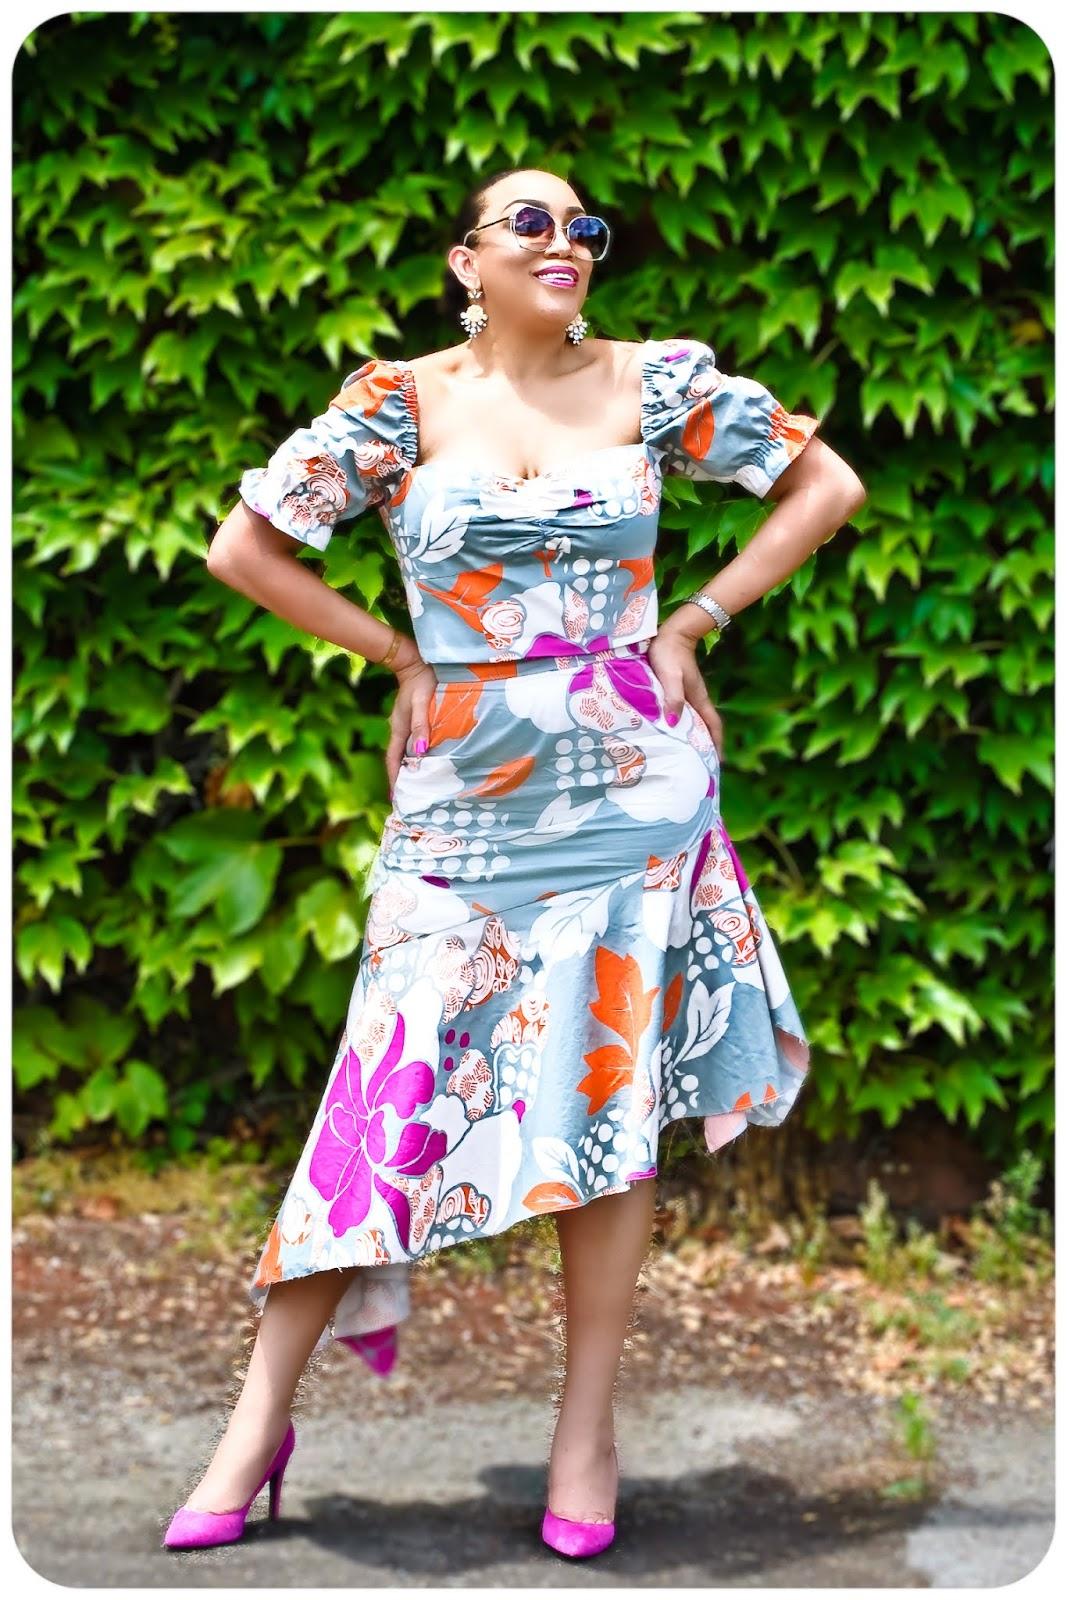 McCall's 7929 Top & McCall's 7725 Skirt - Erica Bunker DIY Style!